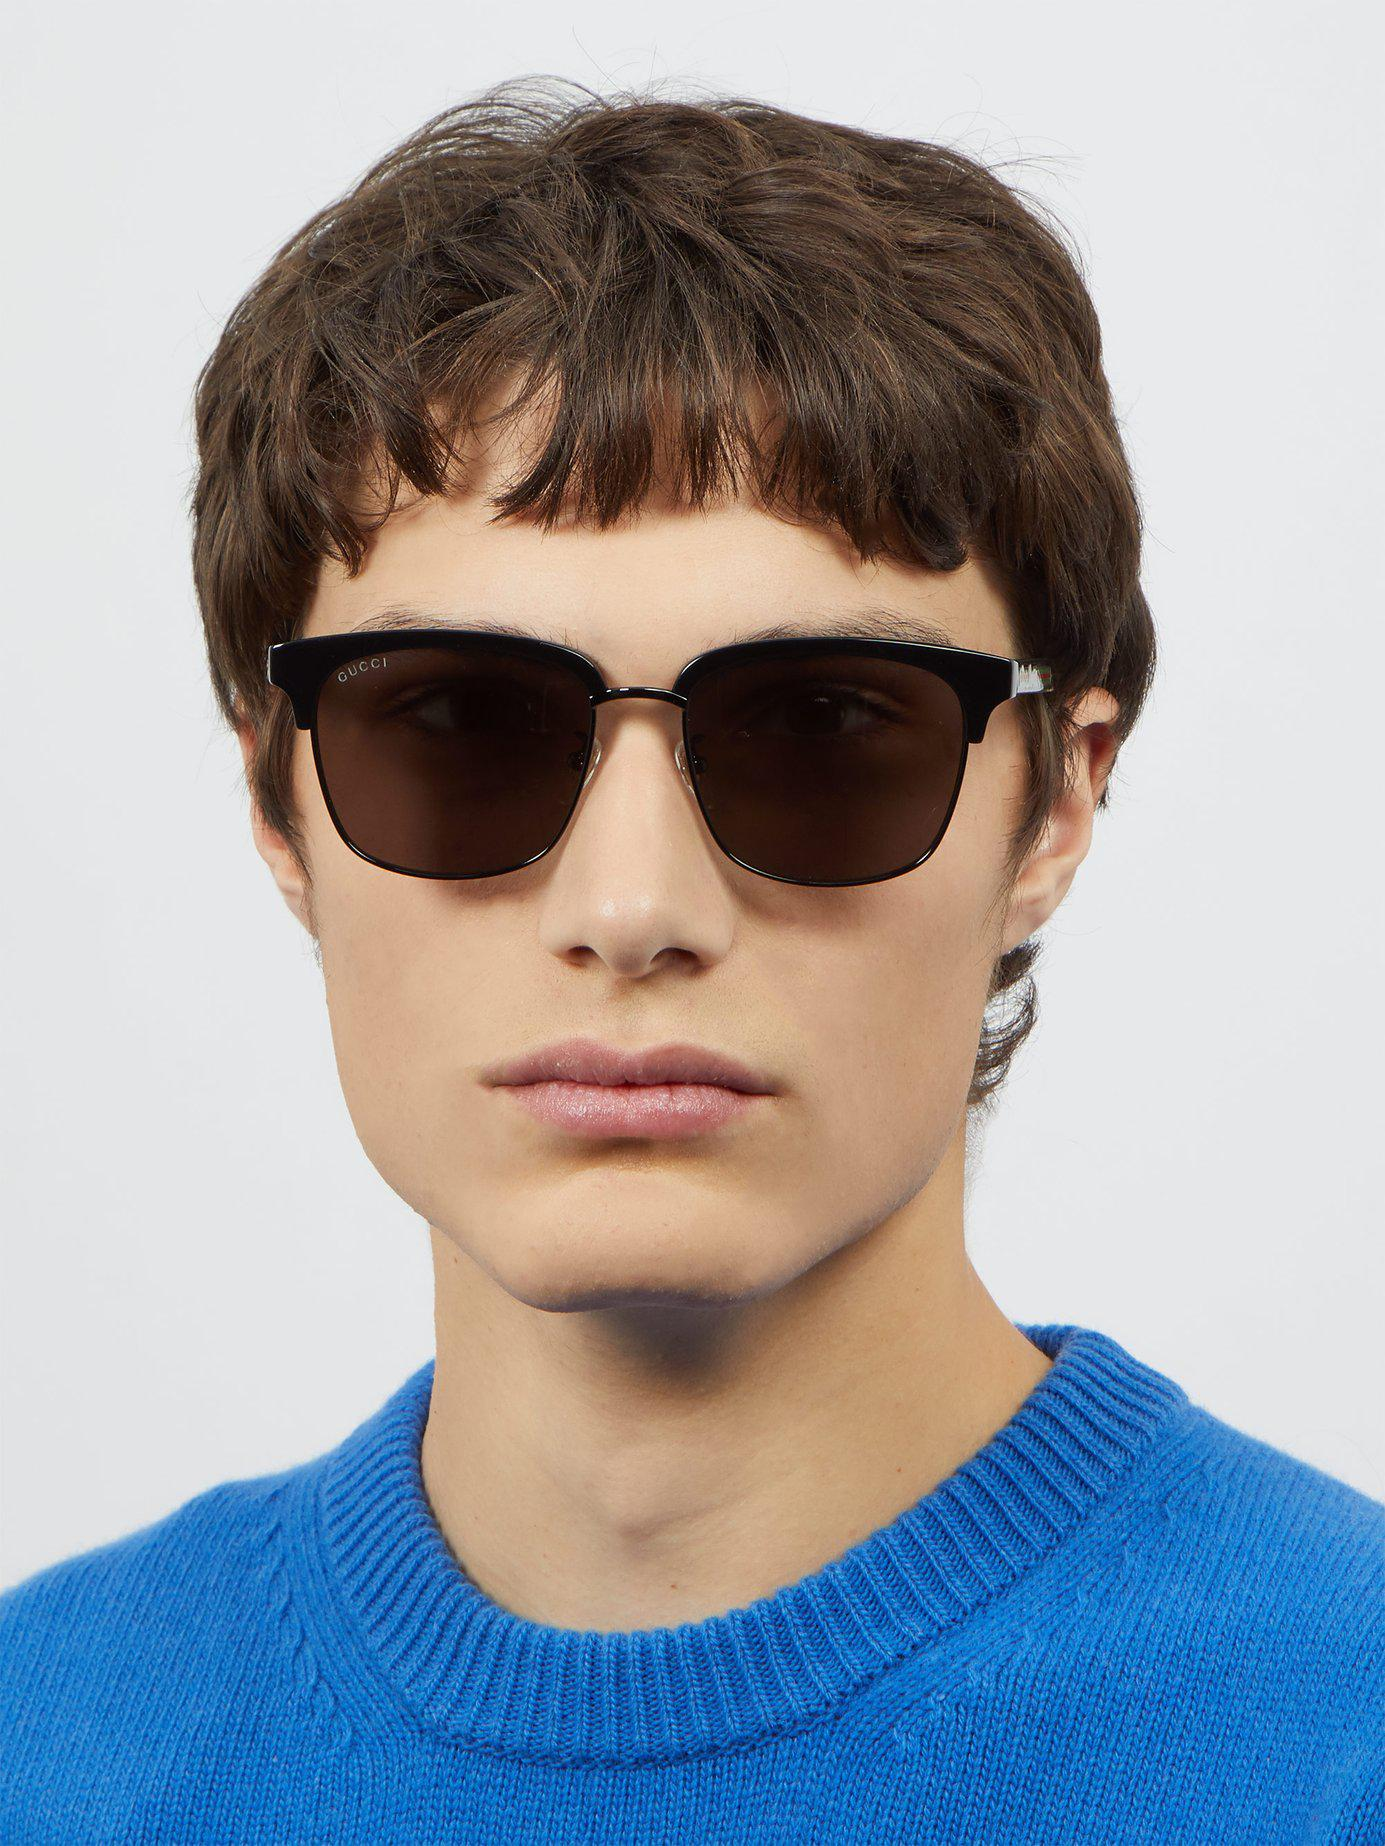 c2ef4b5cc6b Lyst - Gucci Web Striped Acetate And Metal Sunglasses in Black for Men